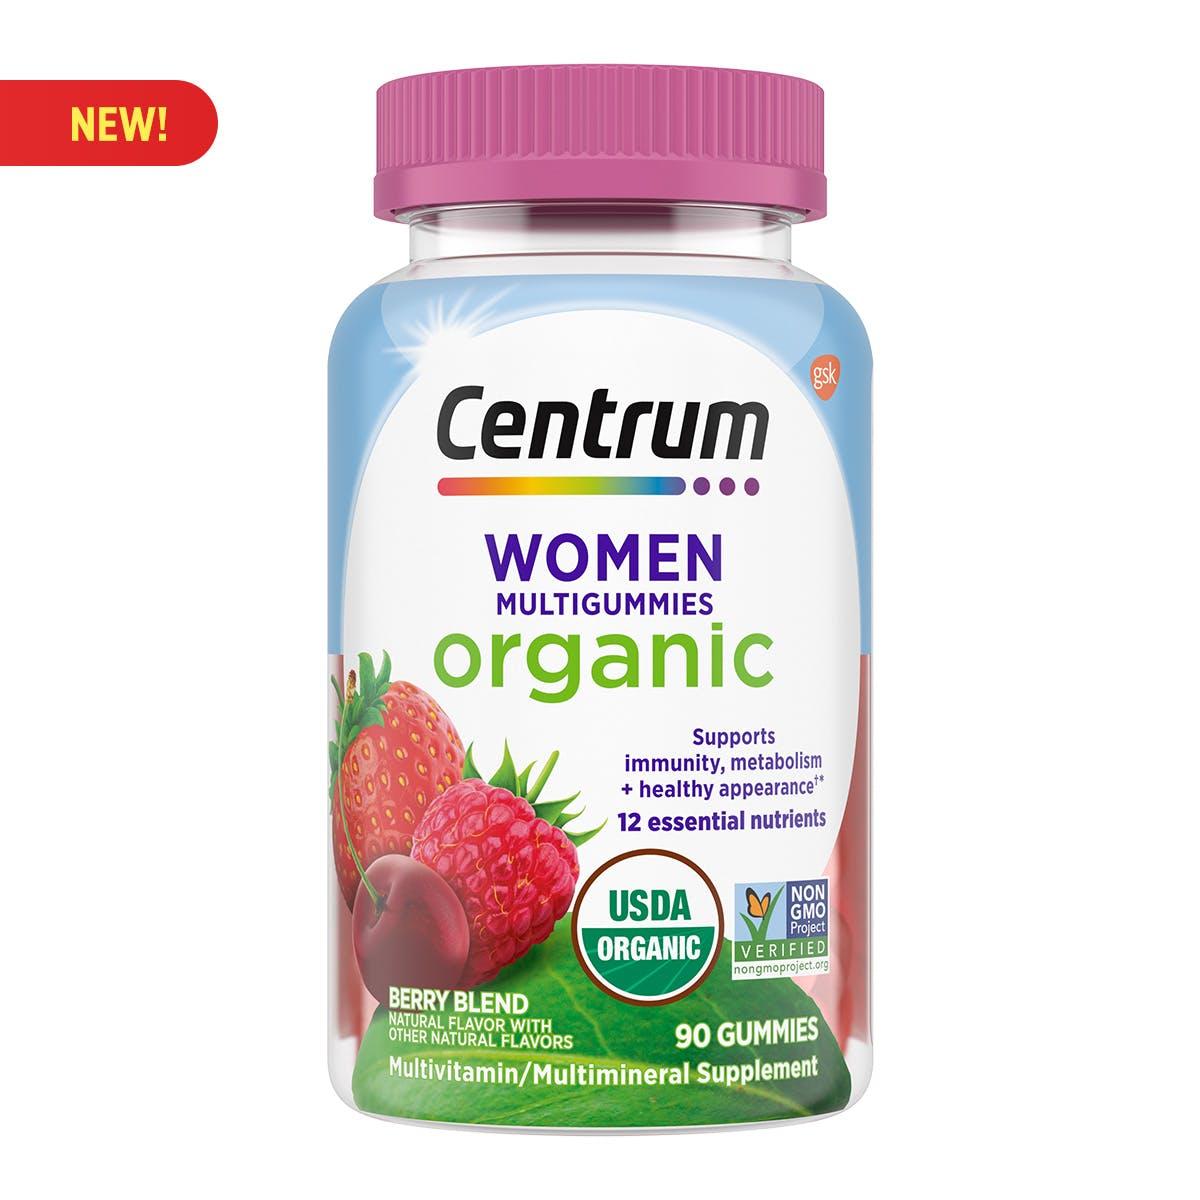 Centrum Organic Womens Multigummies